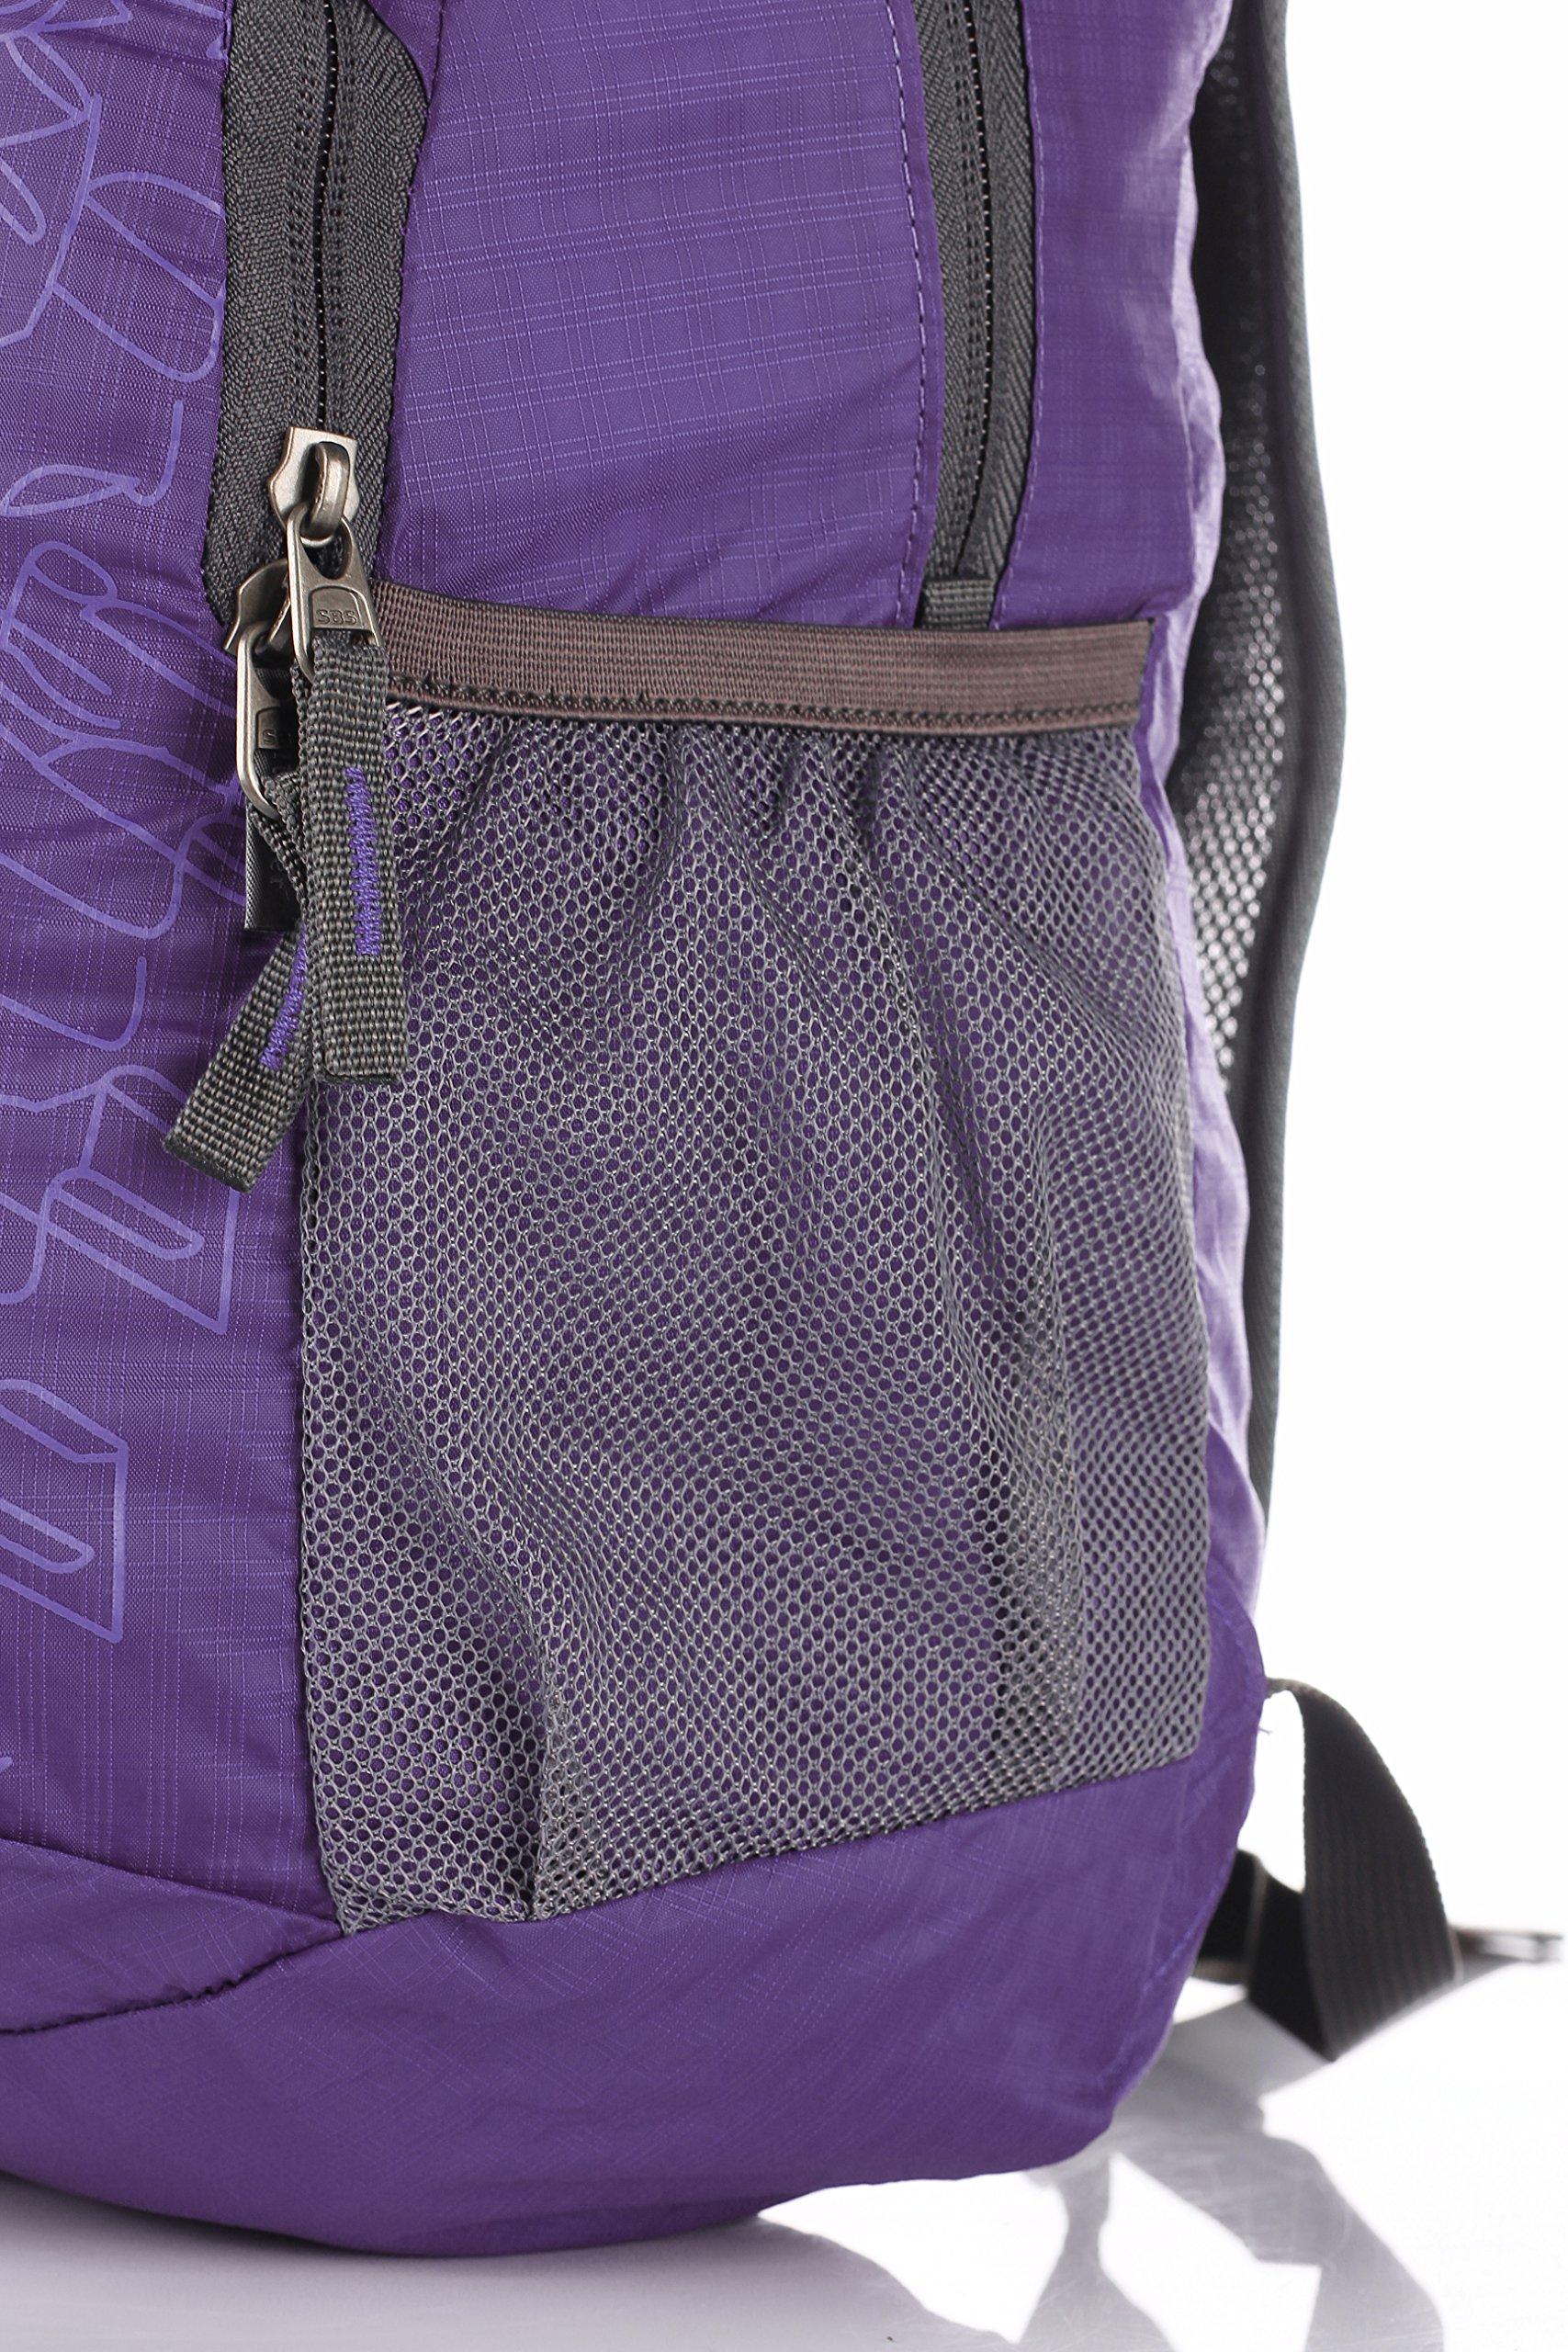 Outlander Packable Handy Lightweight Travel Hiking Backpack Daypack-Purple-L by Outlander (Image #6)